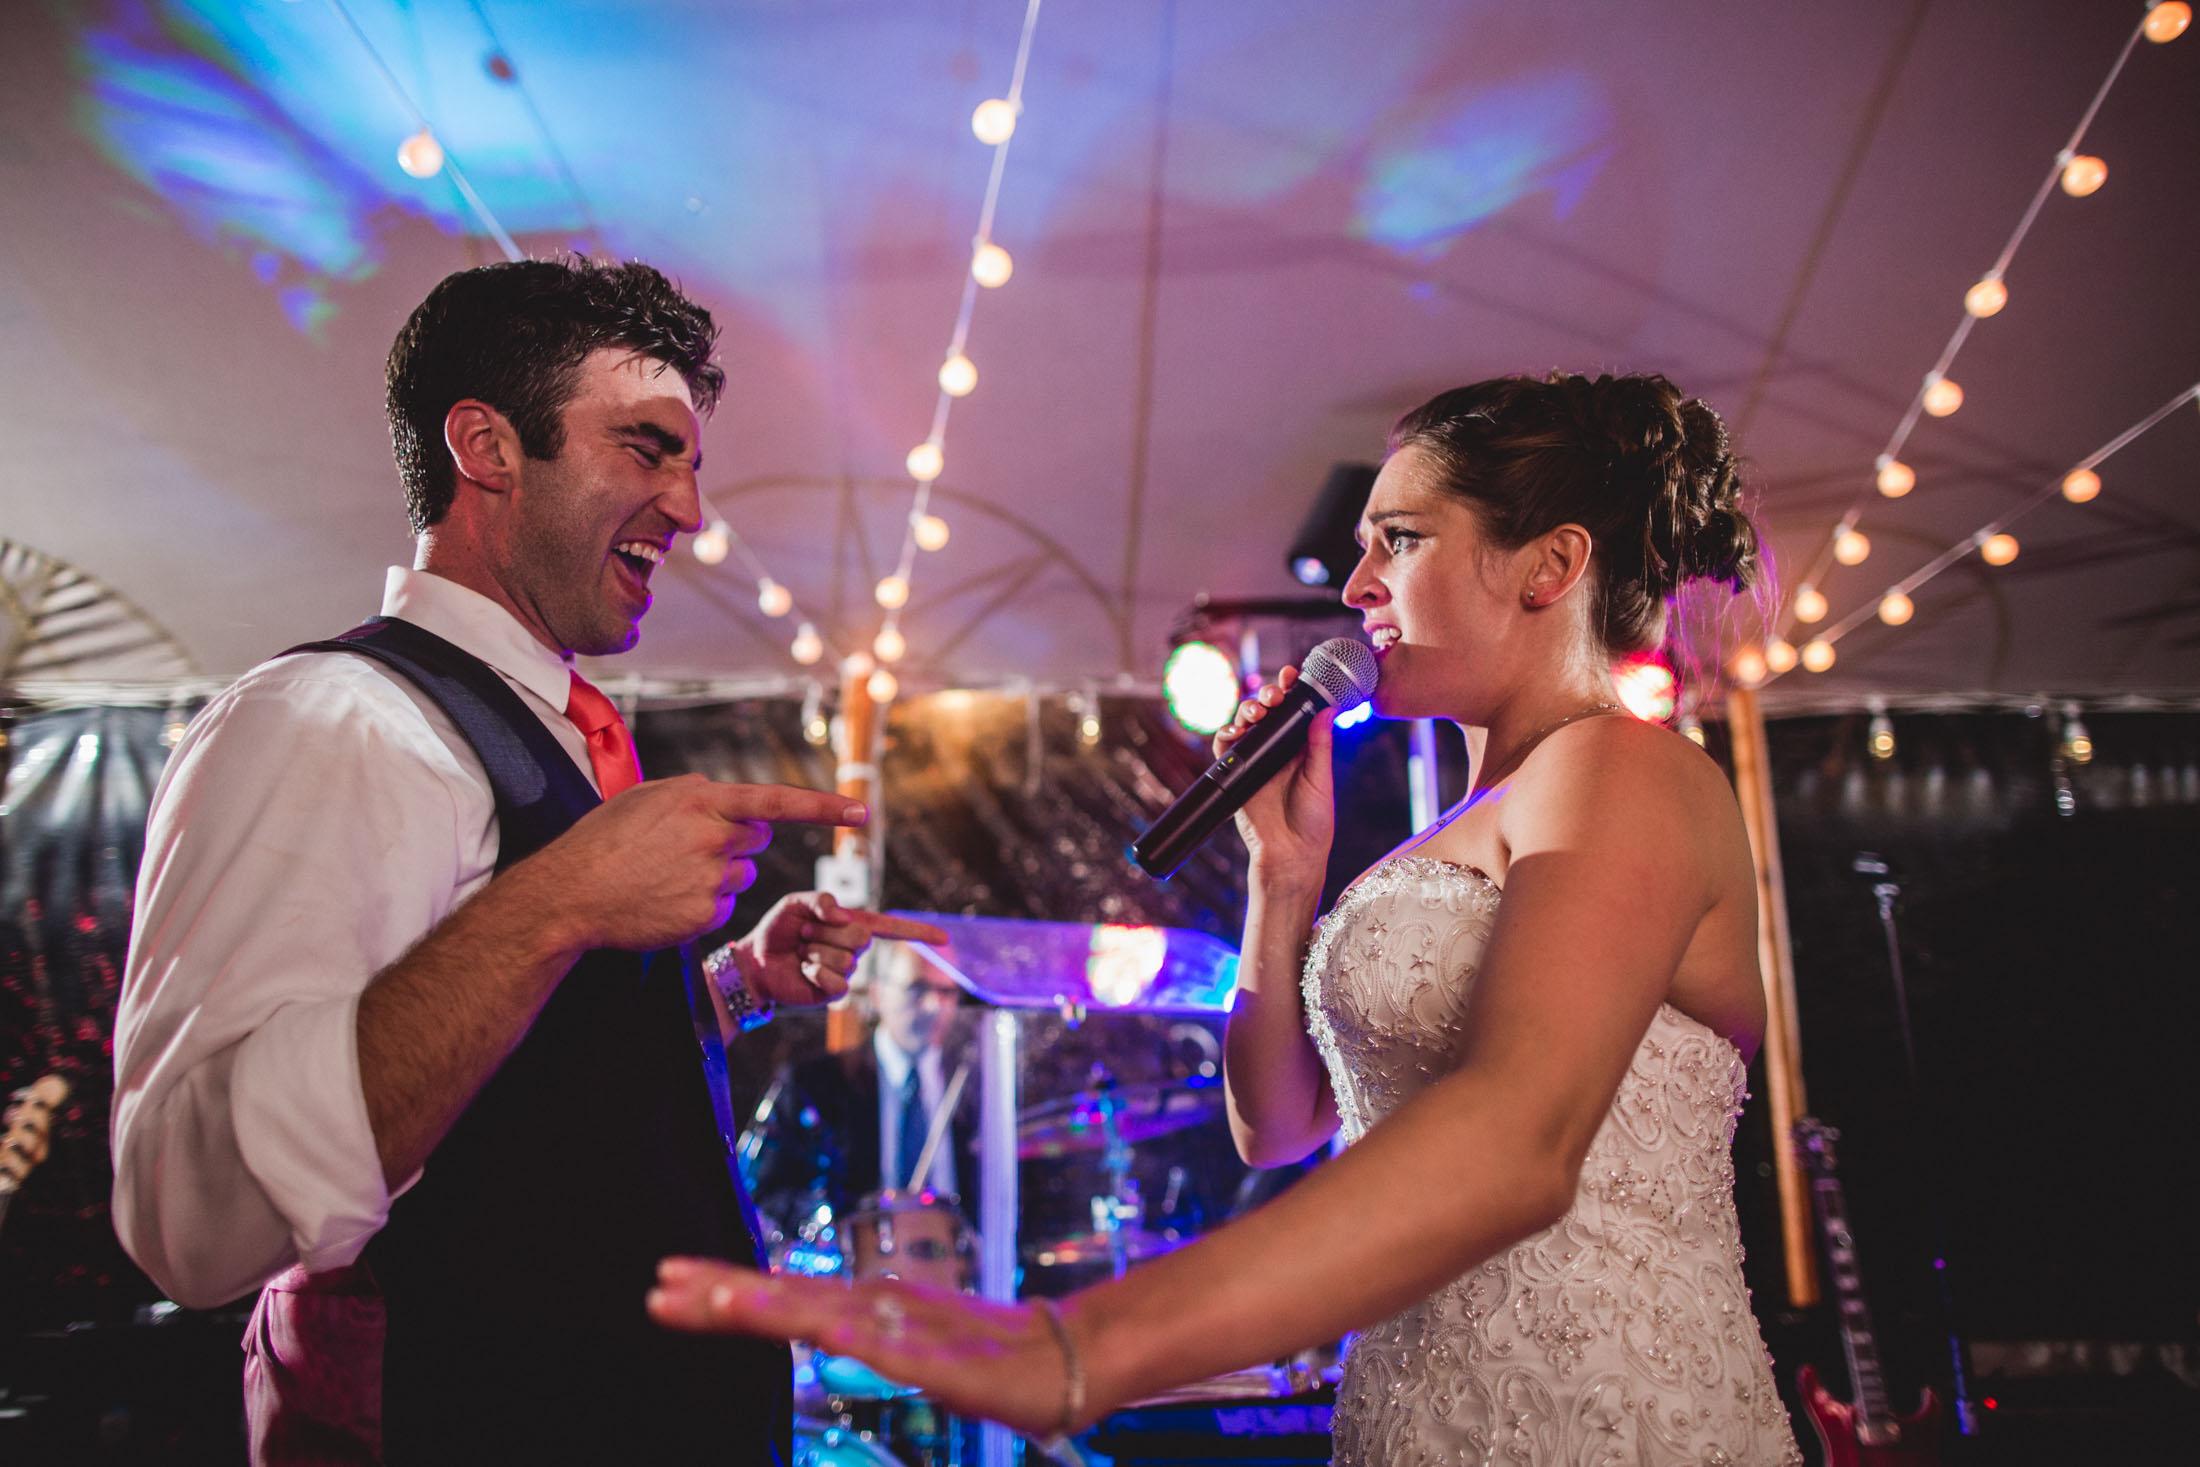 Willowdale-wedding-photography-45.jpg